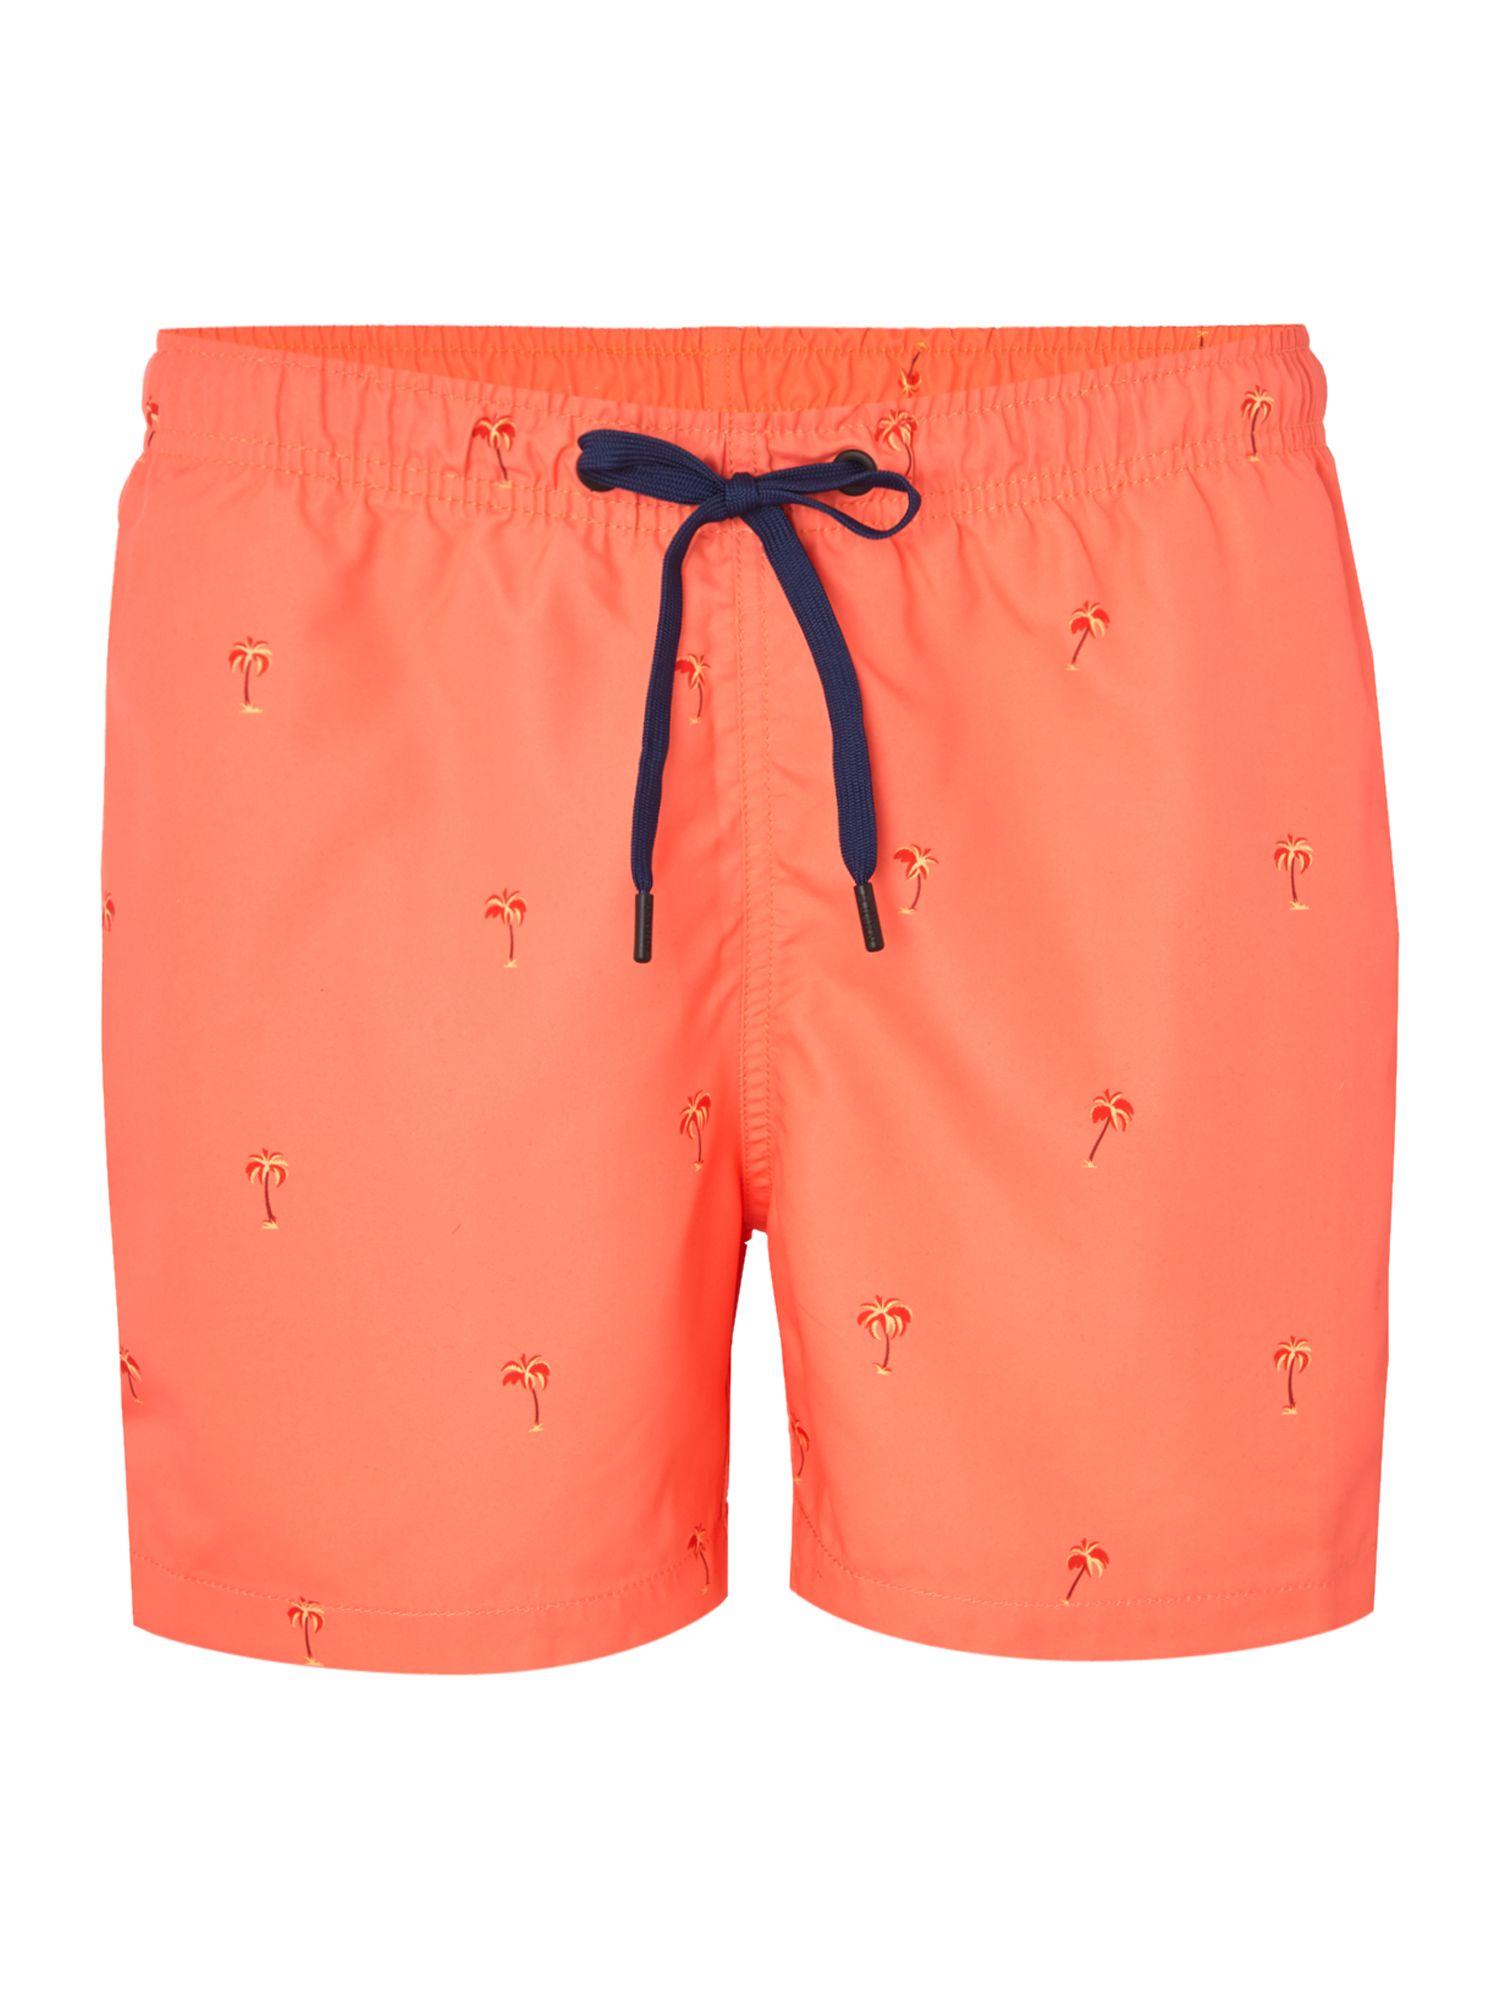 8930f4602b3a2 Björn Borg Mid Length Palm Print Swim Shorts in Orange for Men - Lyst